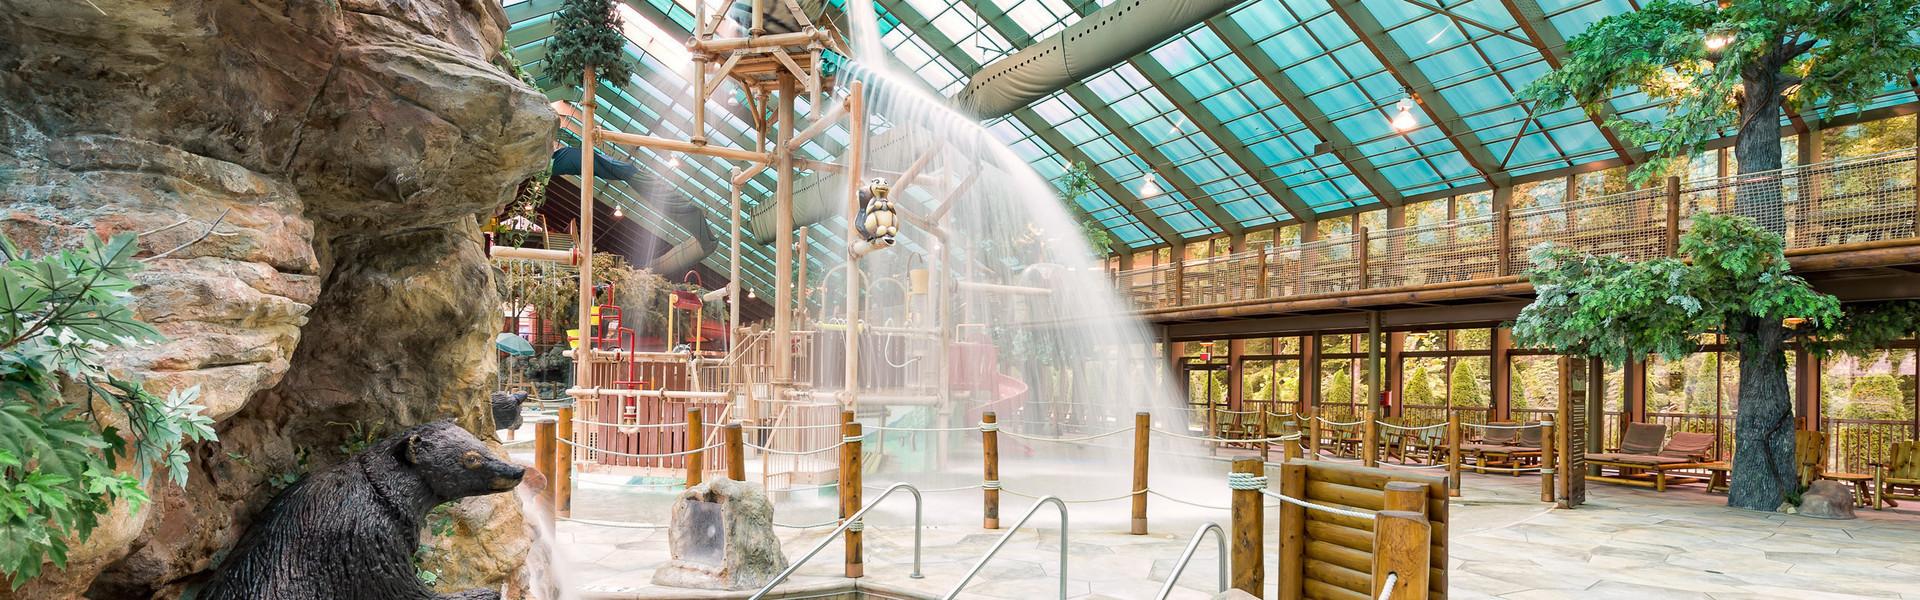 Gatlinburg Resort near the Smoky Mountains | Indoor Waterpark